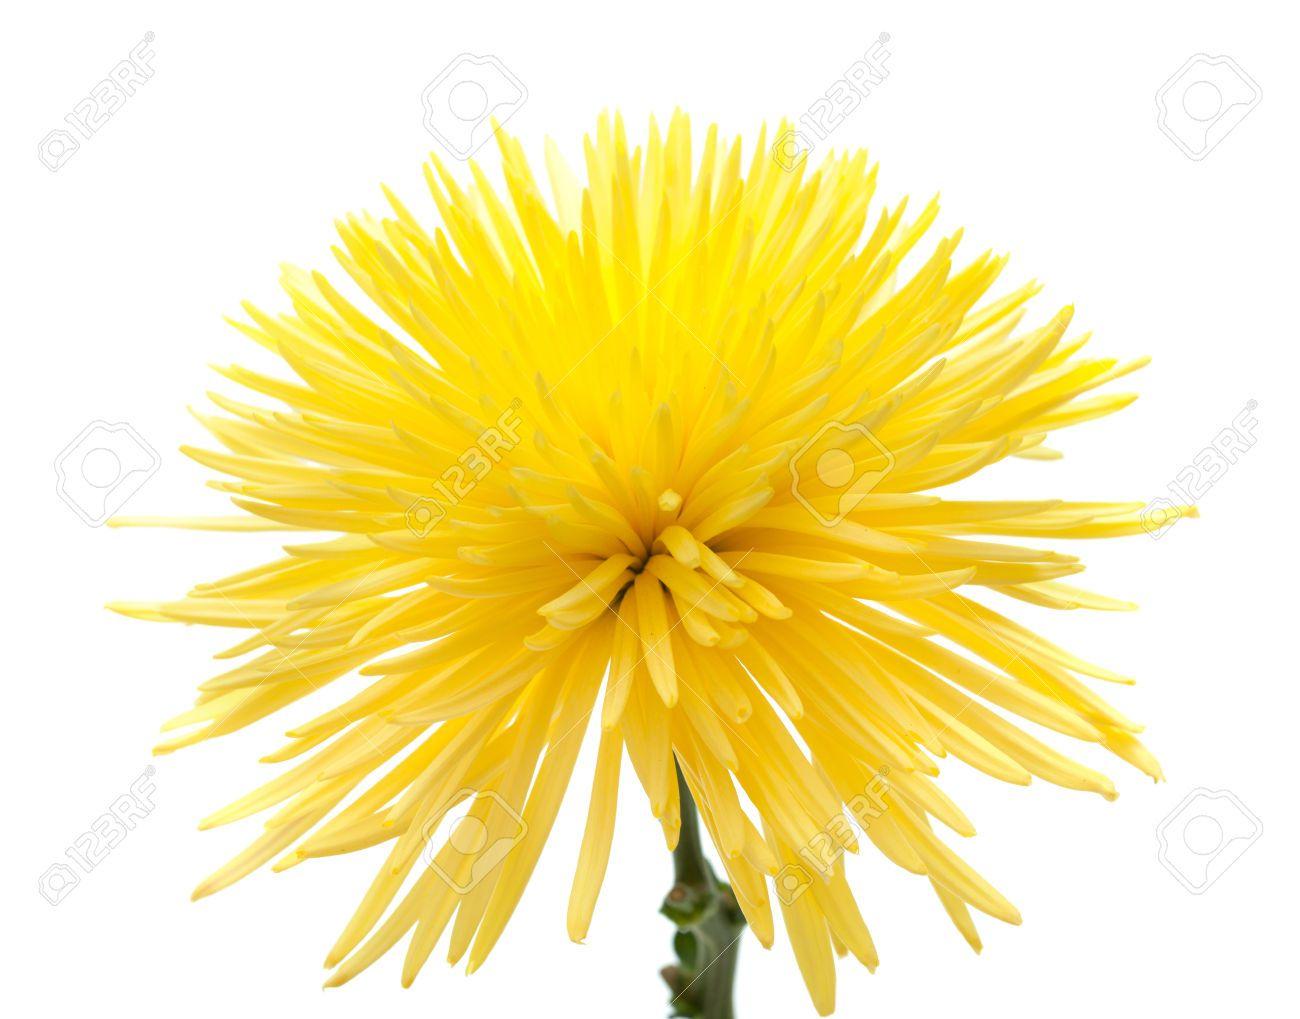 Crisantemo amarillo. Fondo blanco.